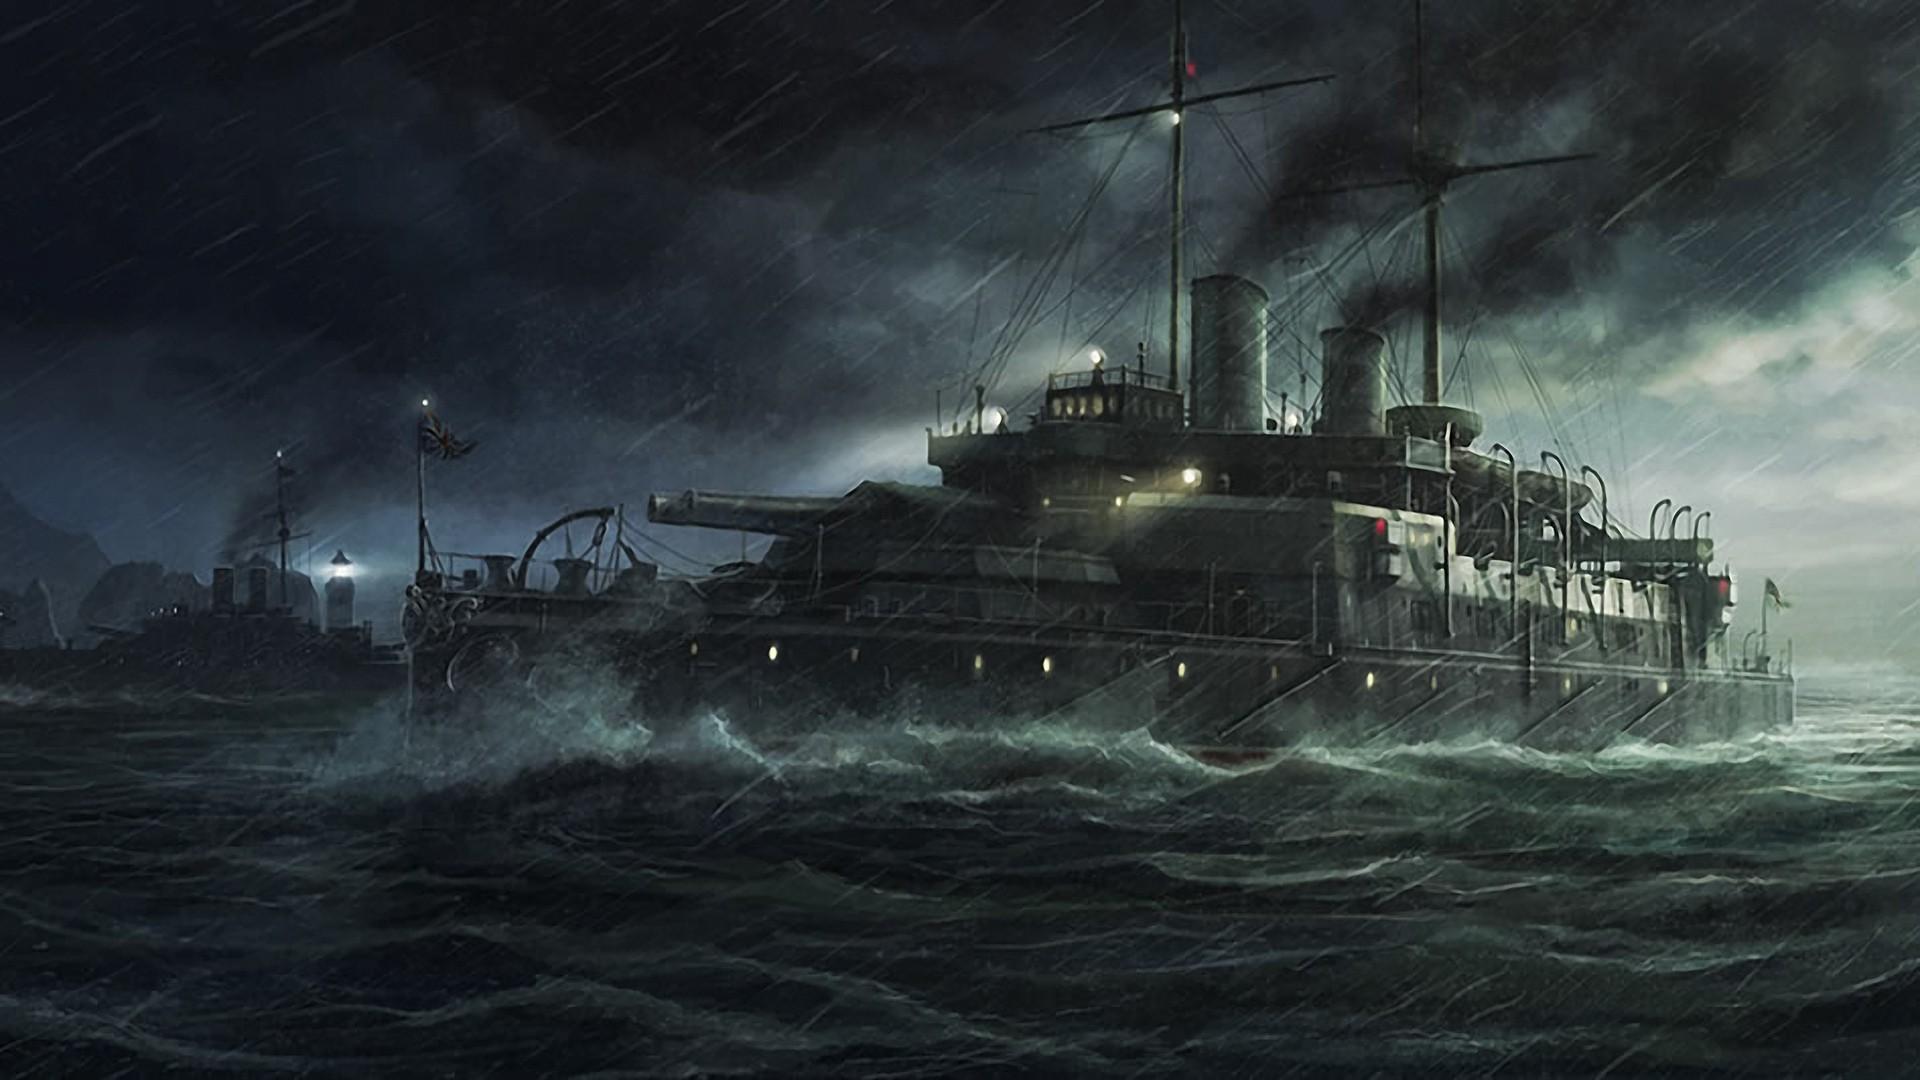 TITANIC-disaster-drama-romance-ship-boat-yh-x-wallpaper-wp38011228